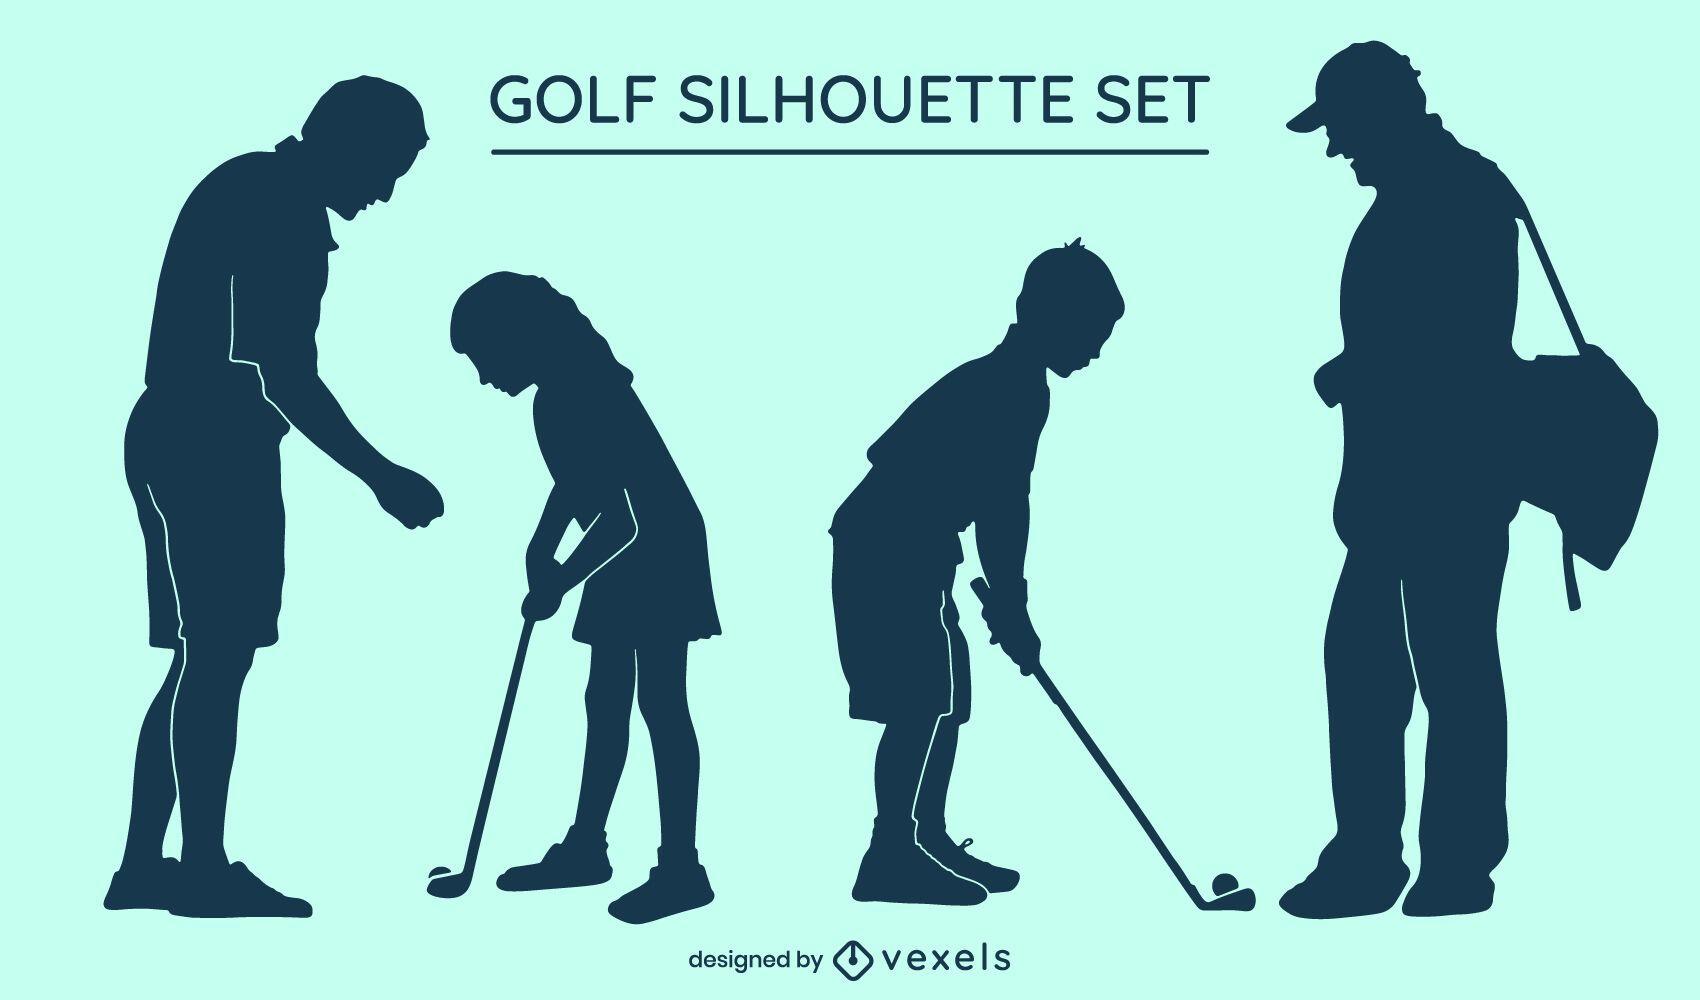 Golf silhouette set